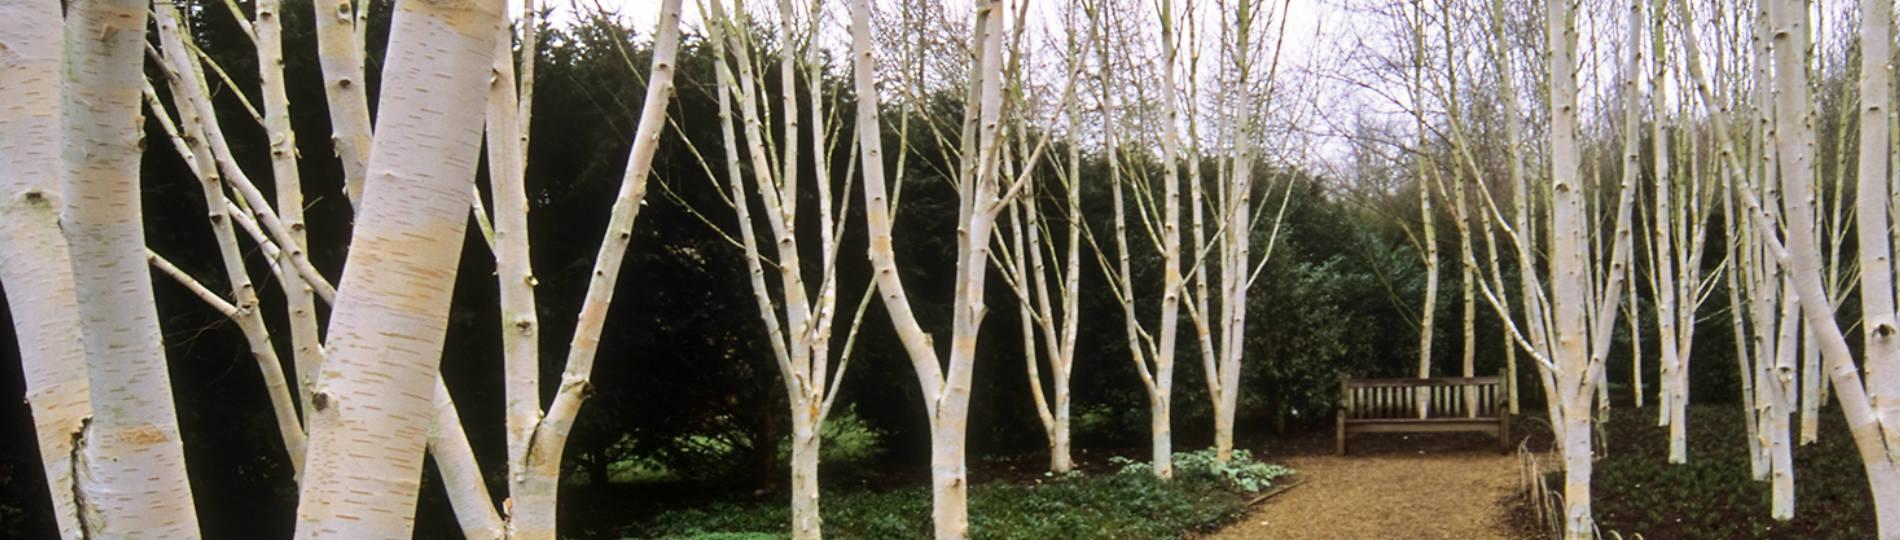 White bark plant aging process